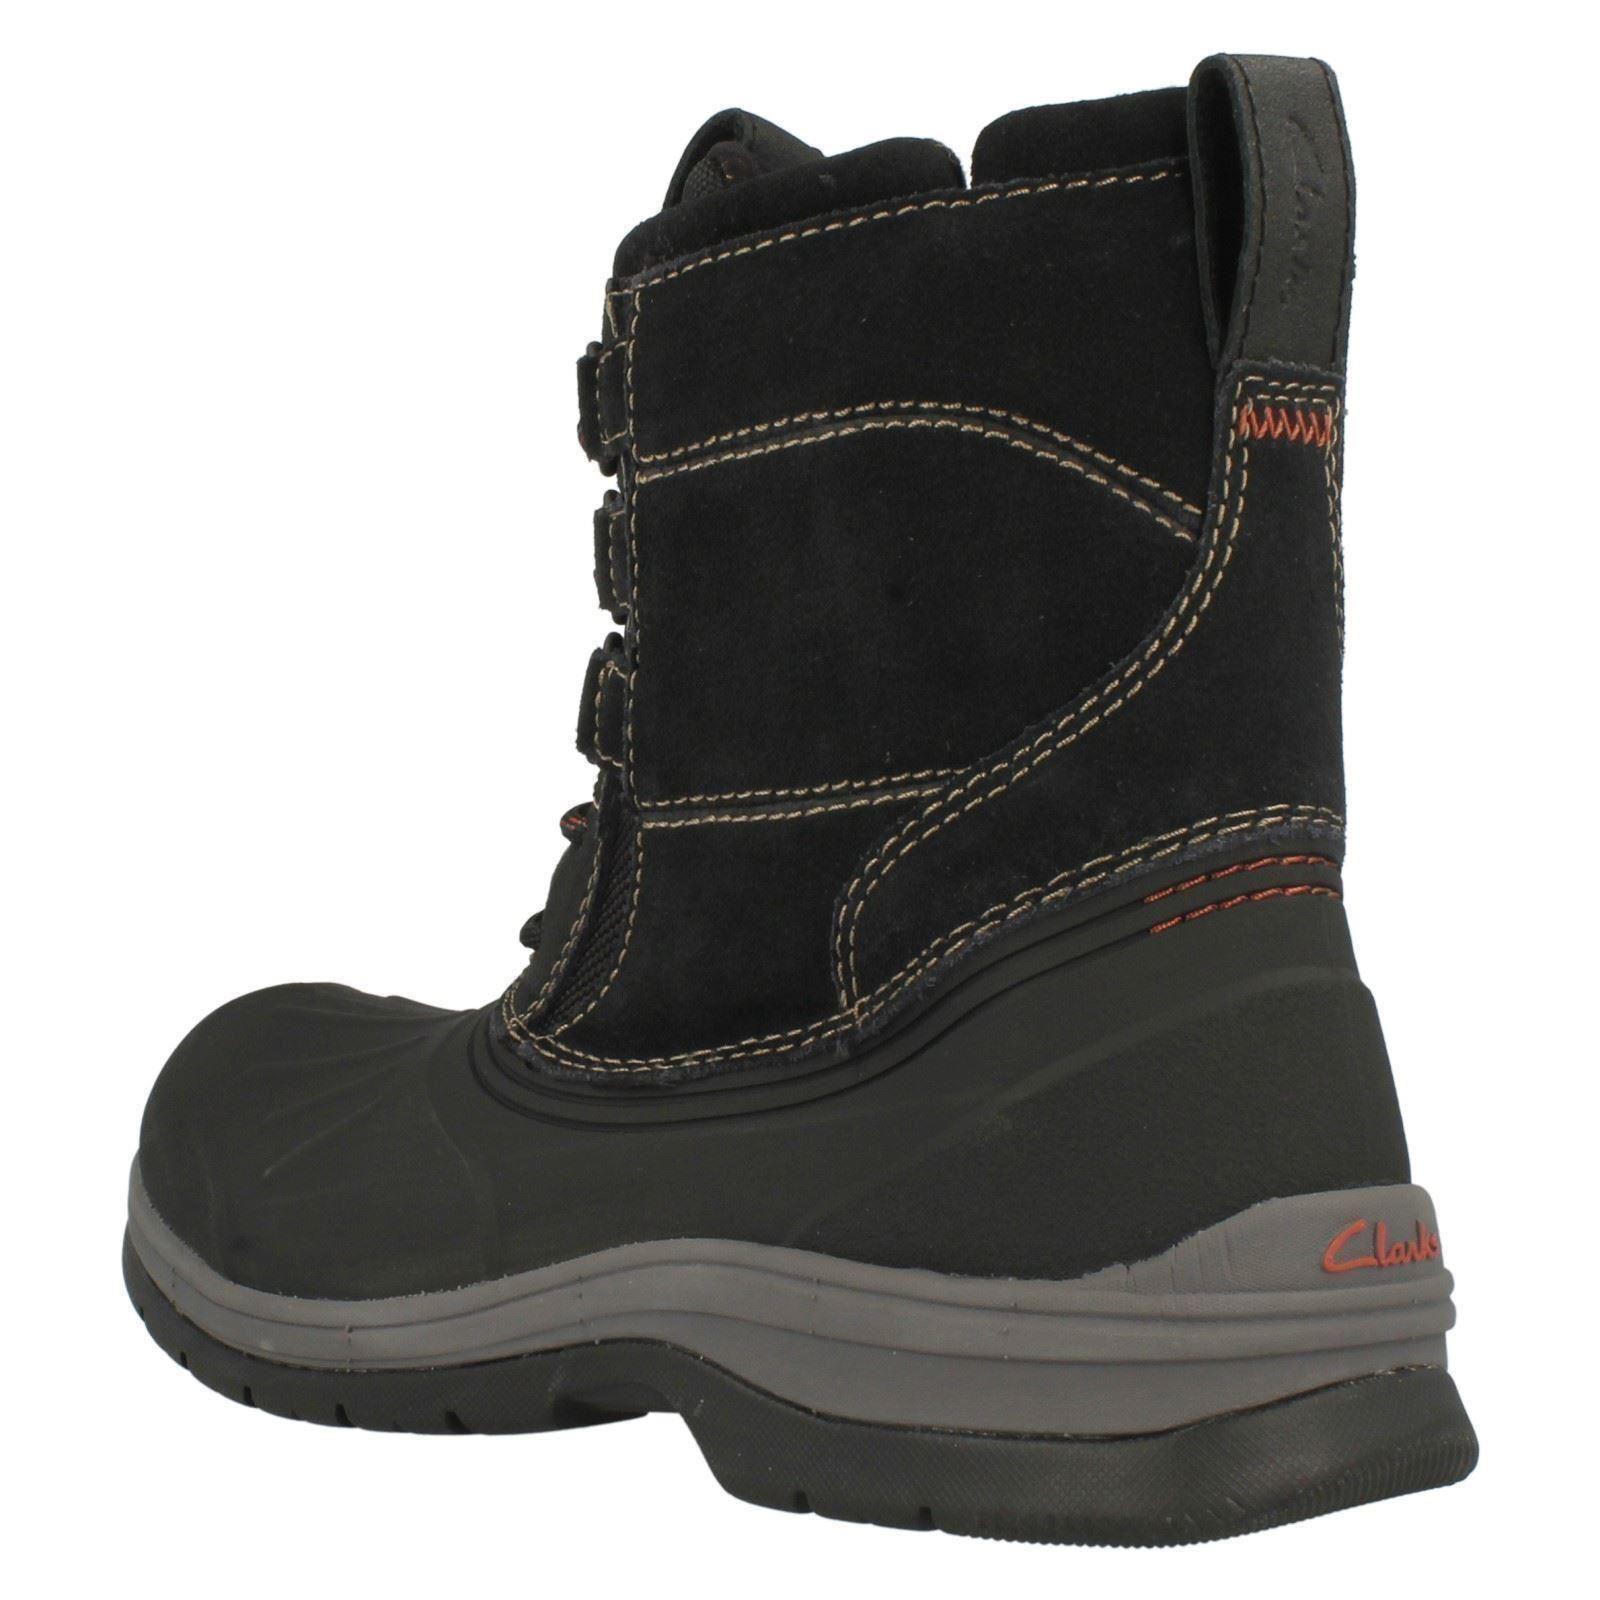 Mens-Clarks-Outdoor-Boots-Nashoba-Summit thumbnail 8